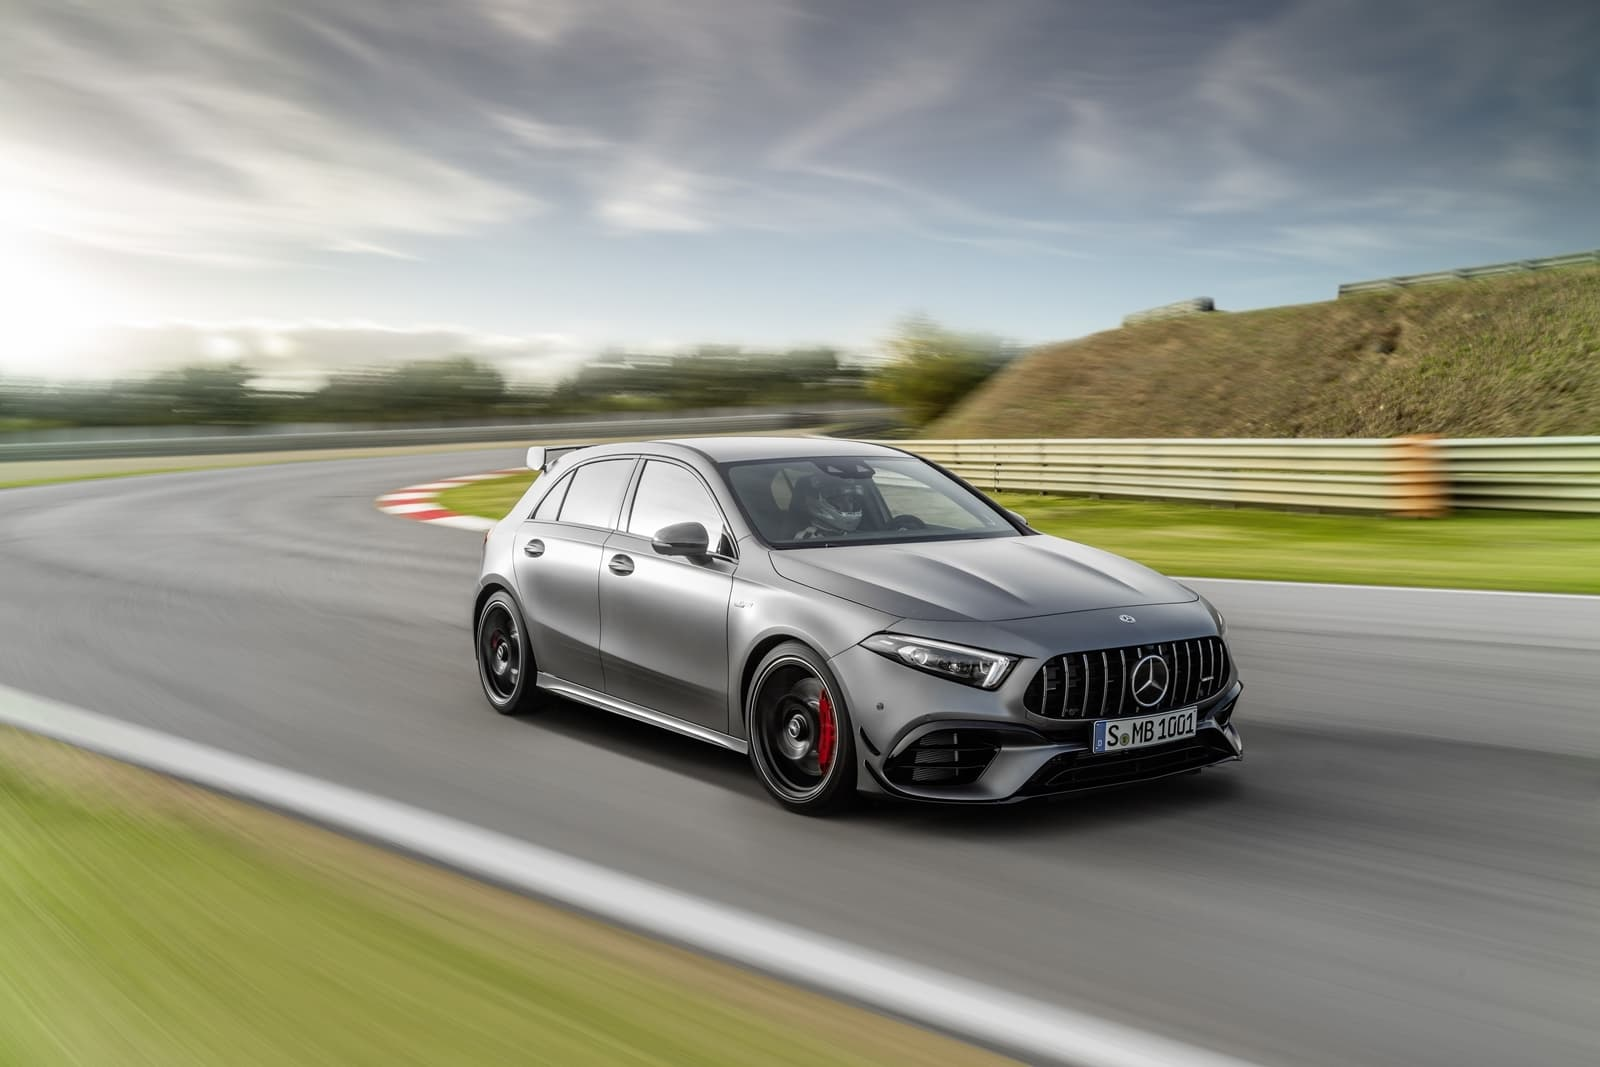 Mercedes Amg A 45 S 4matic+ (2019) Mercedes Amg A 45 S 4matic+ (2019)